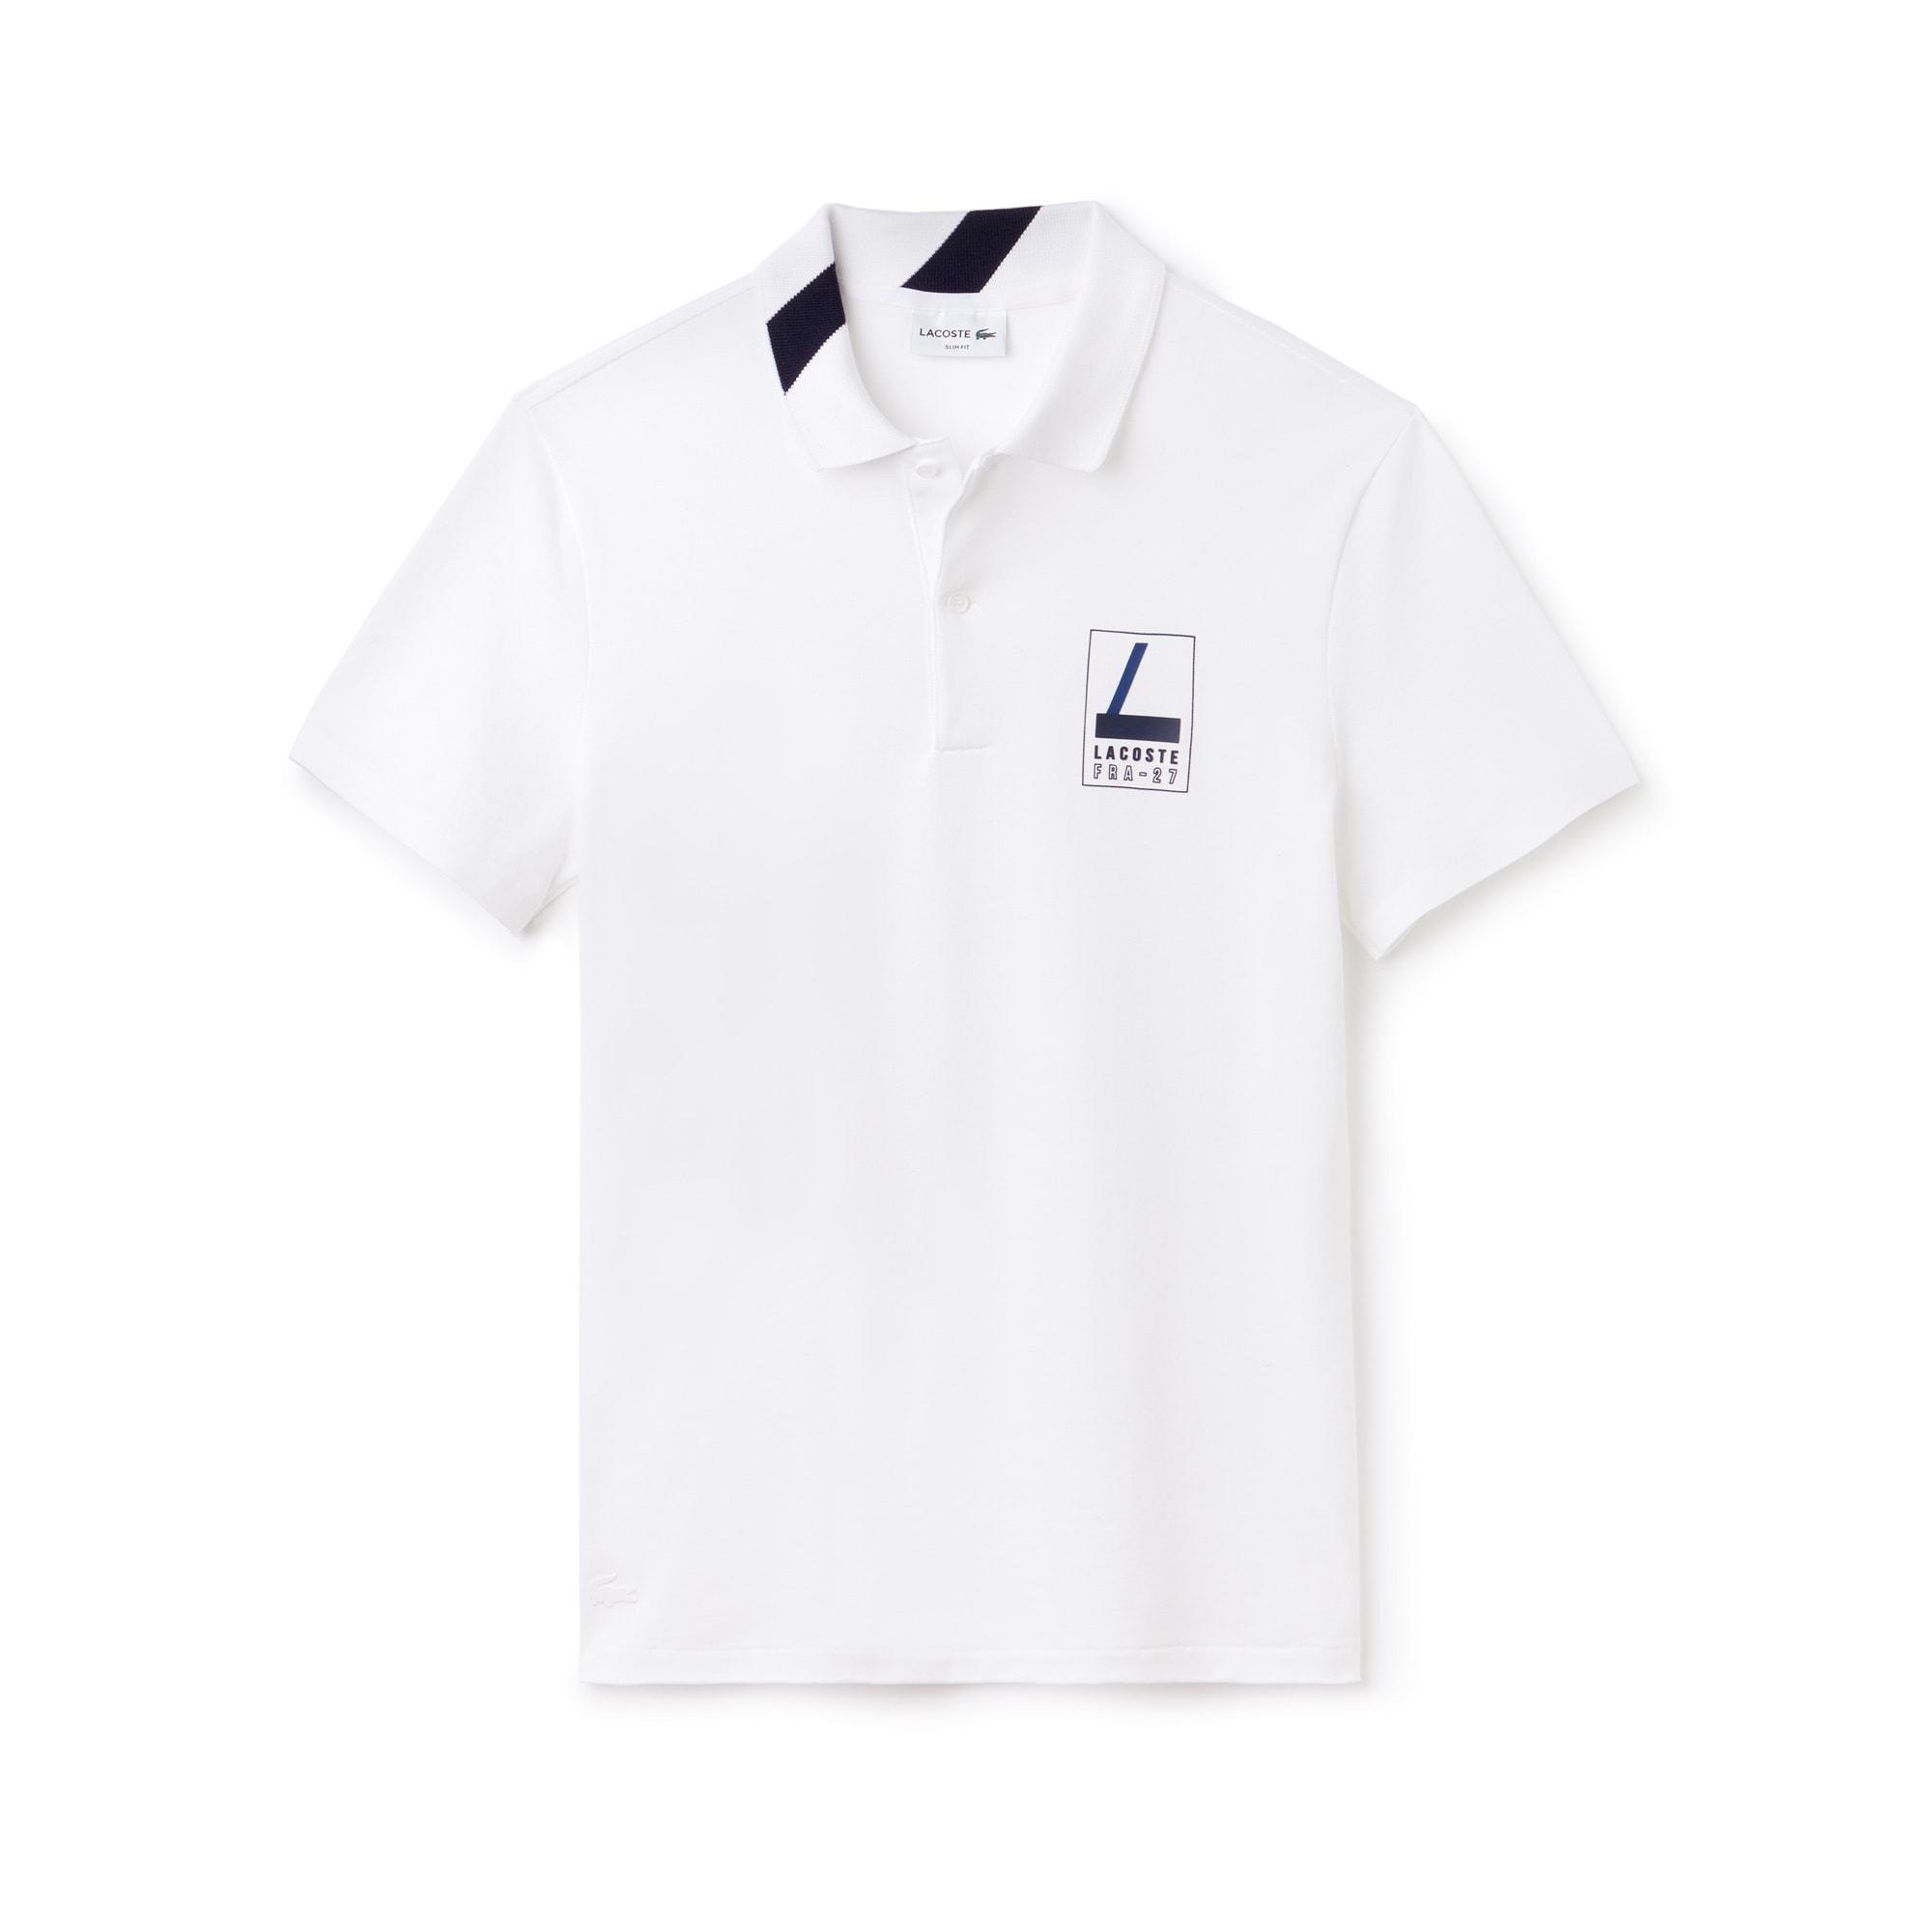 Lacoste男士修身版字母弹力迷你凸纹网眼面料polo衫